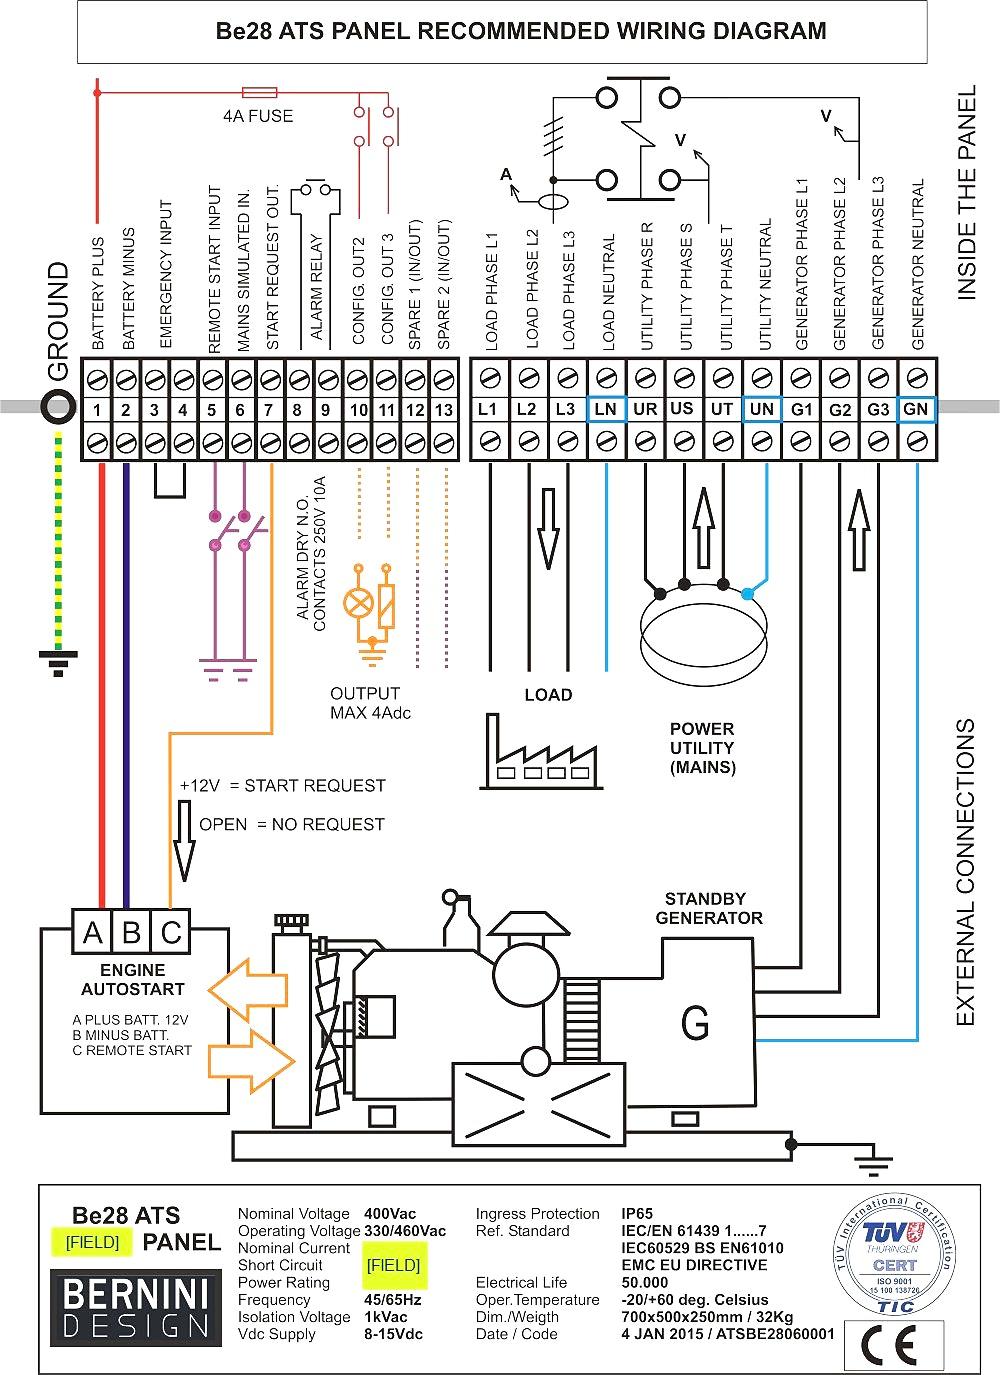 Wiring Diagrams As Well Manual Transfer Switch Diagram How To Install For Generator Bundadaffacom Gen Tran Trusted Schematic U2022 Rh Sarome Co